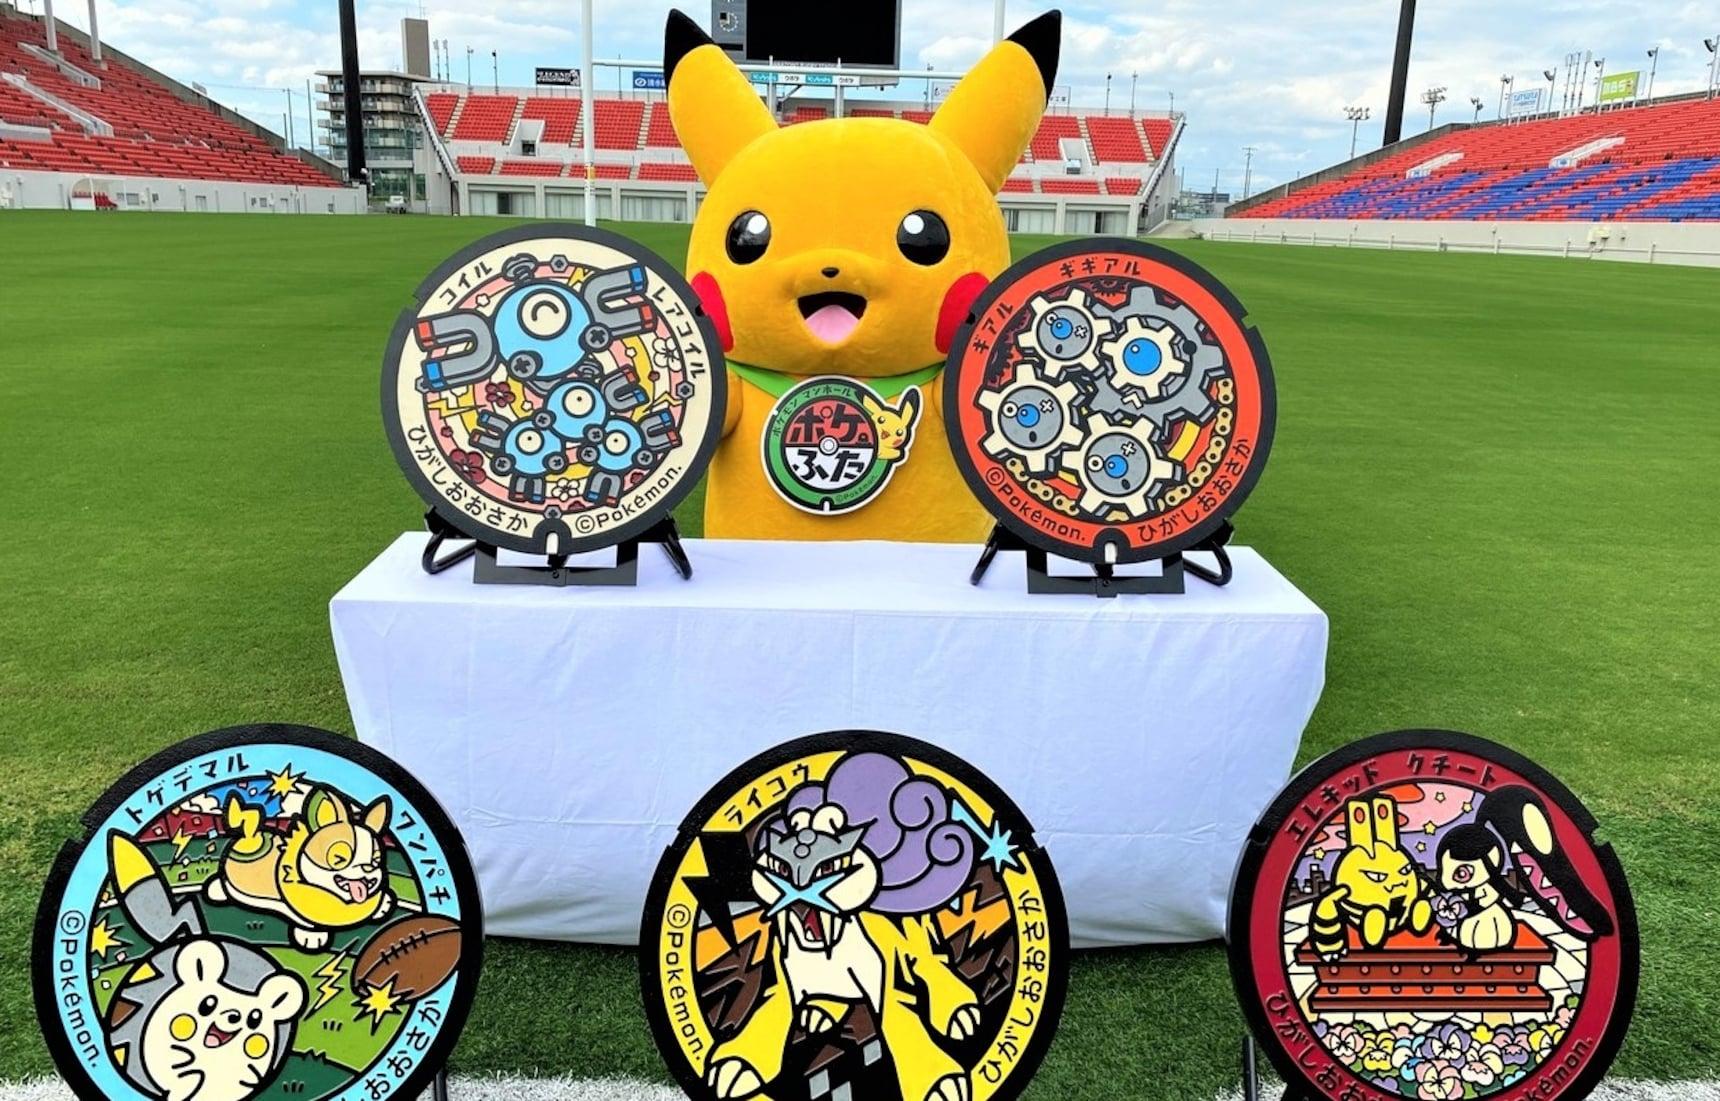 Pokémon Manhole Covers Adorn Japan's Streets